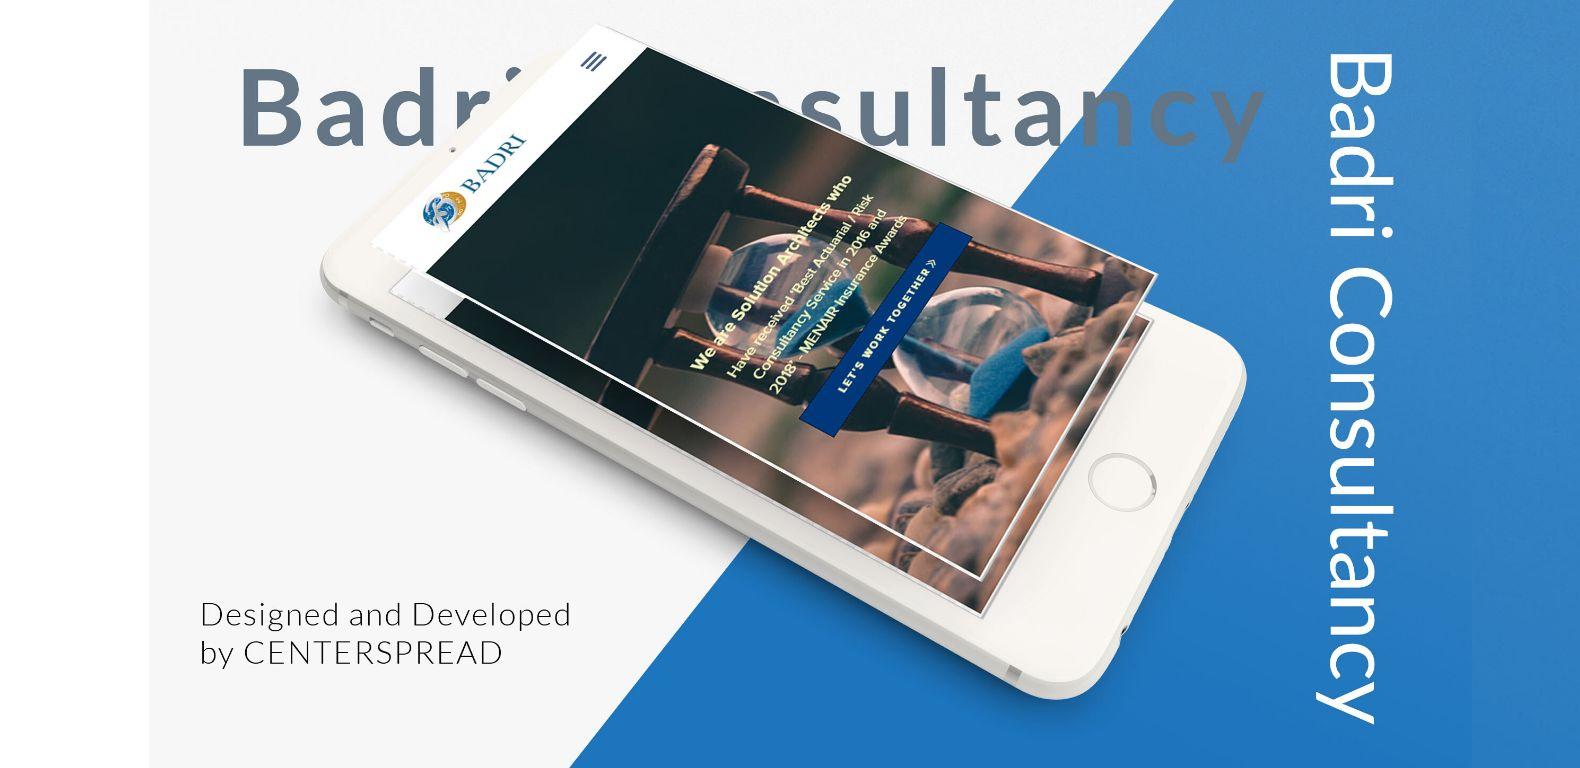 Badri-Consultancy-website-Mobile-version